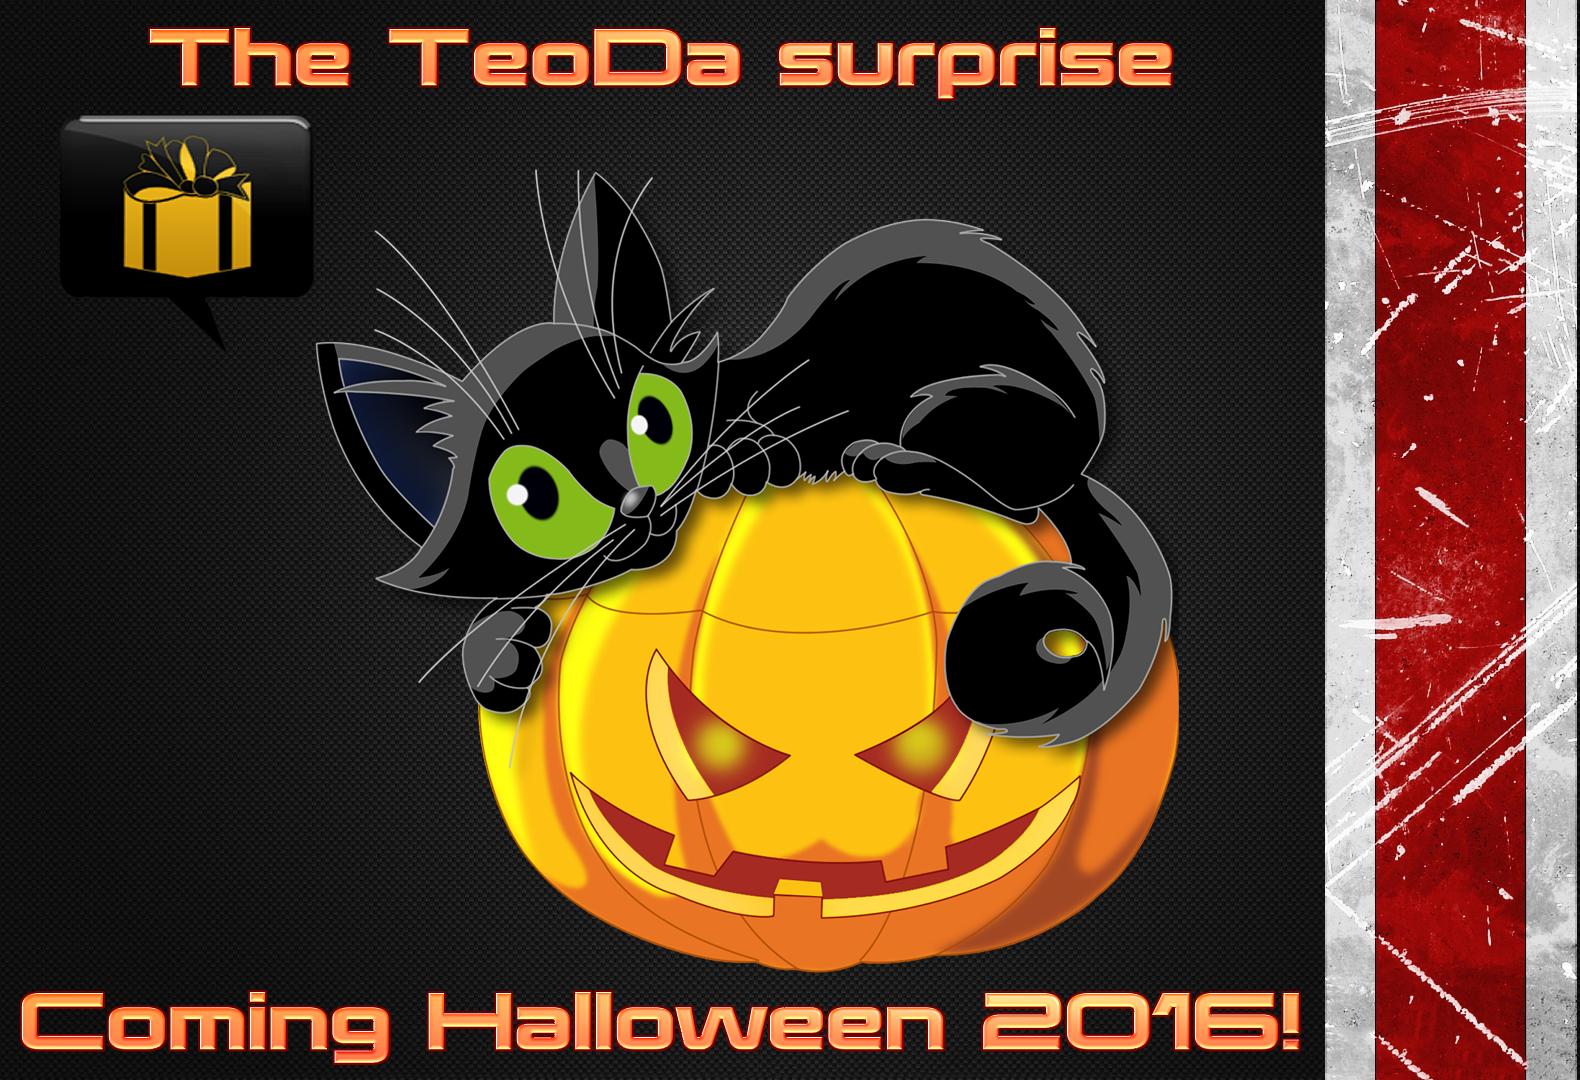 TeoDA special 2016